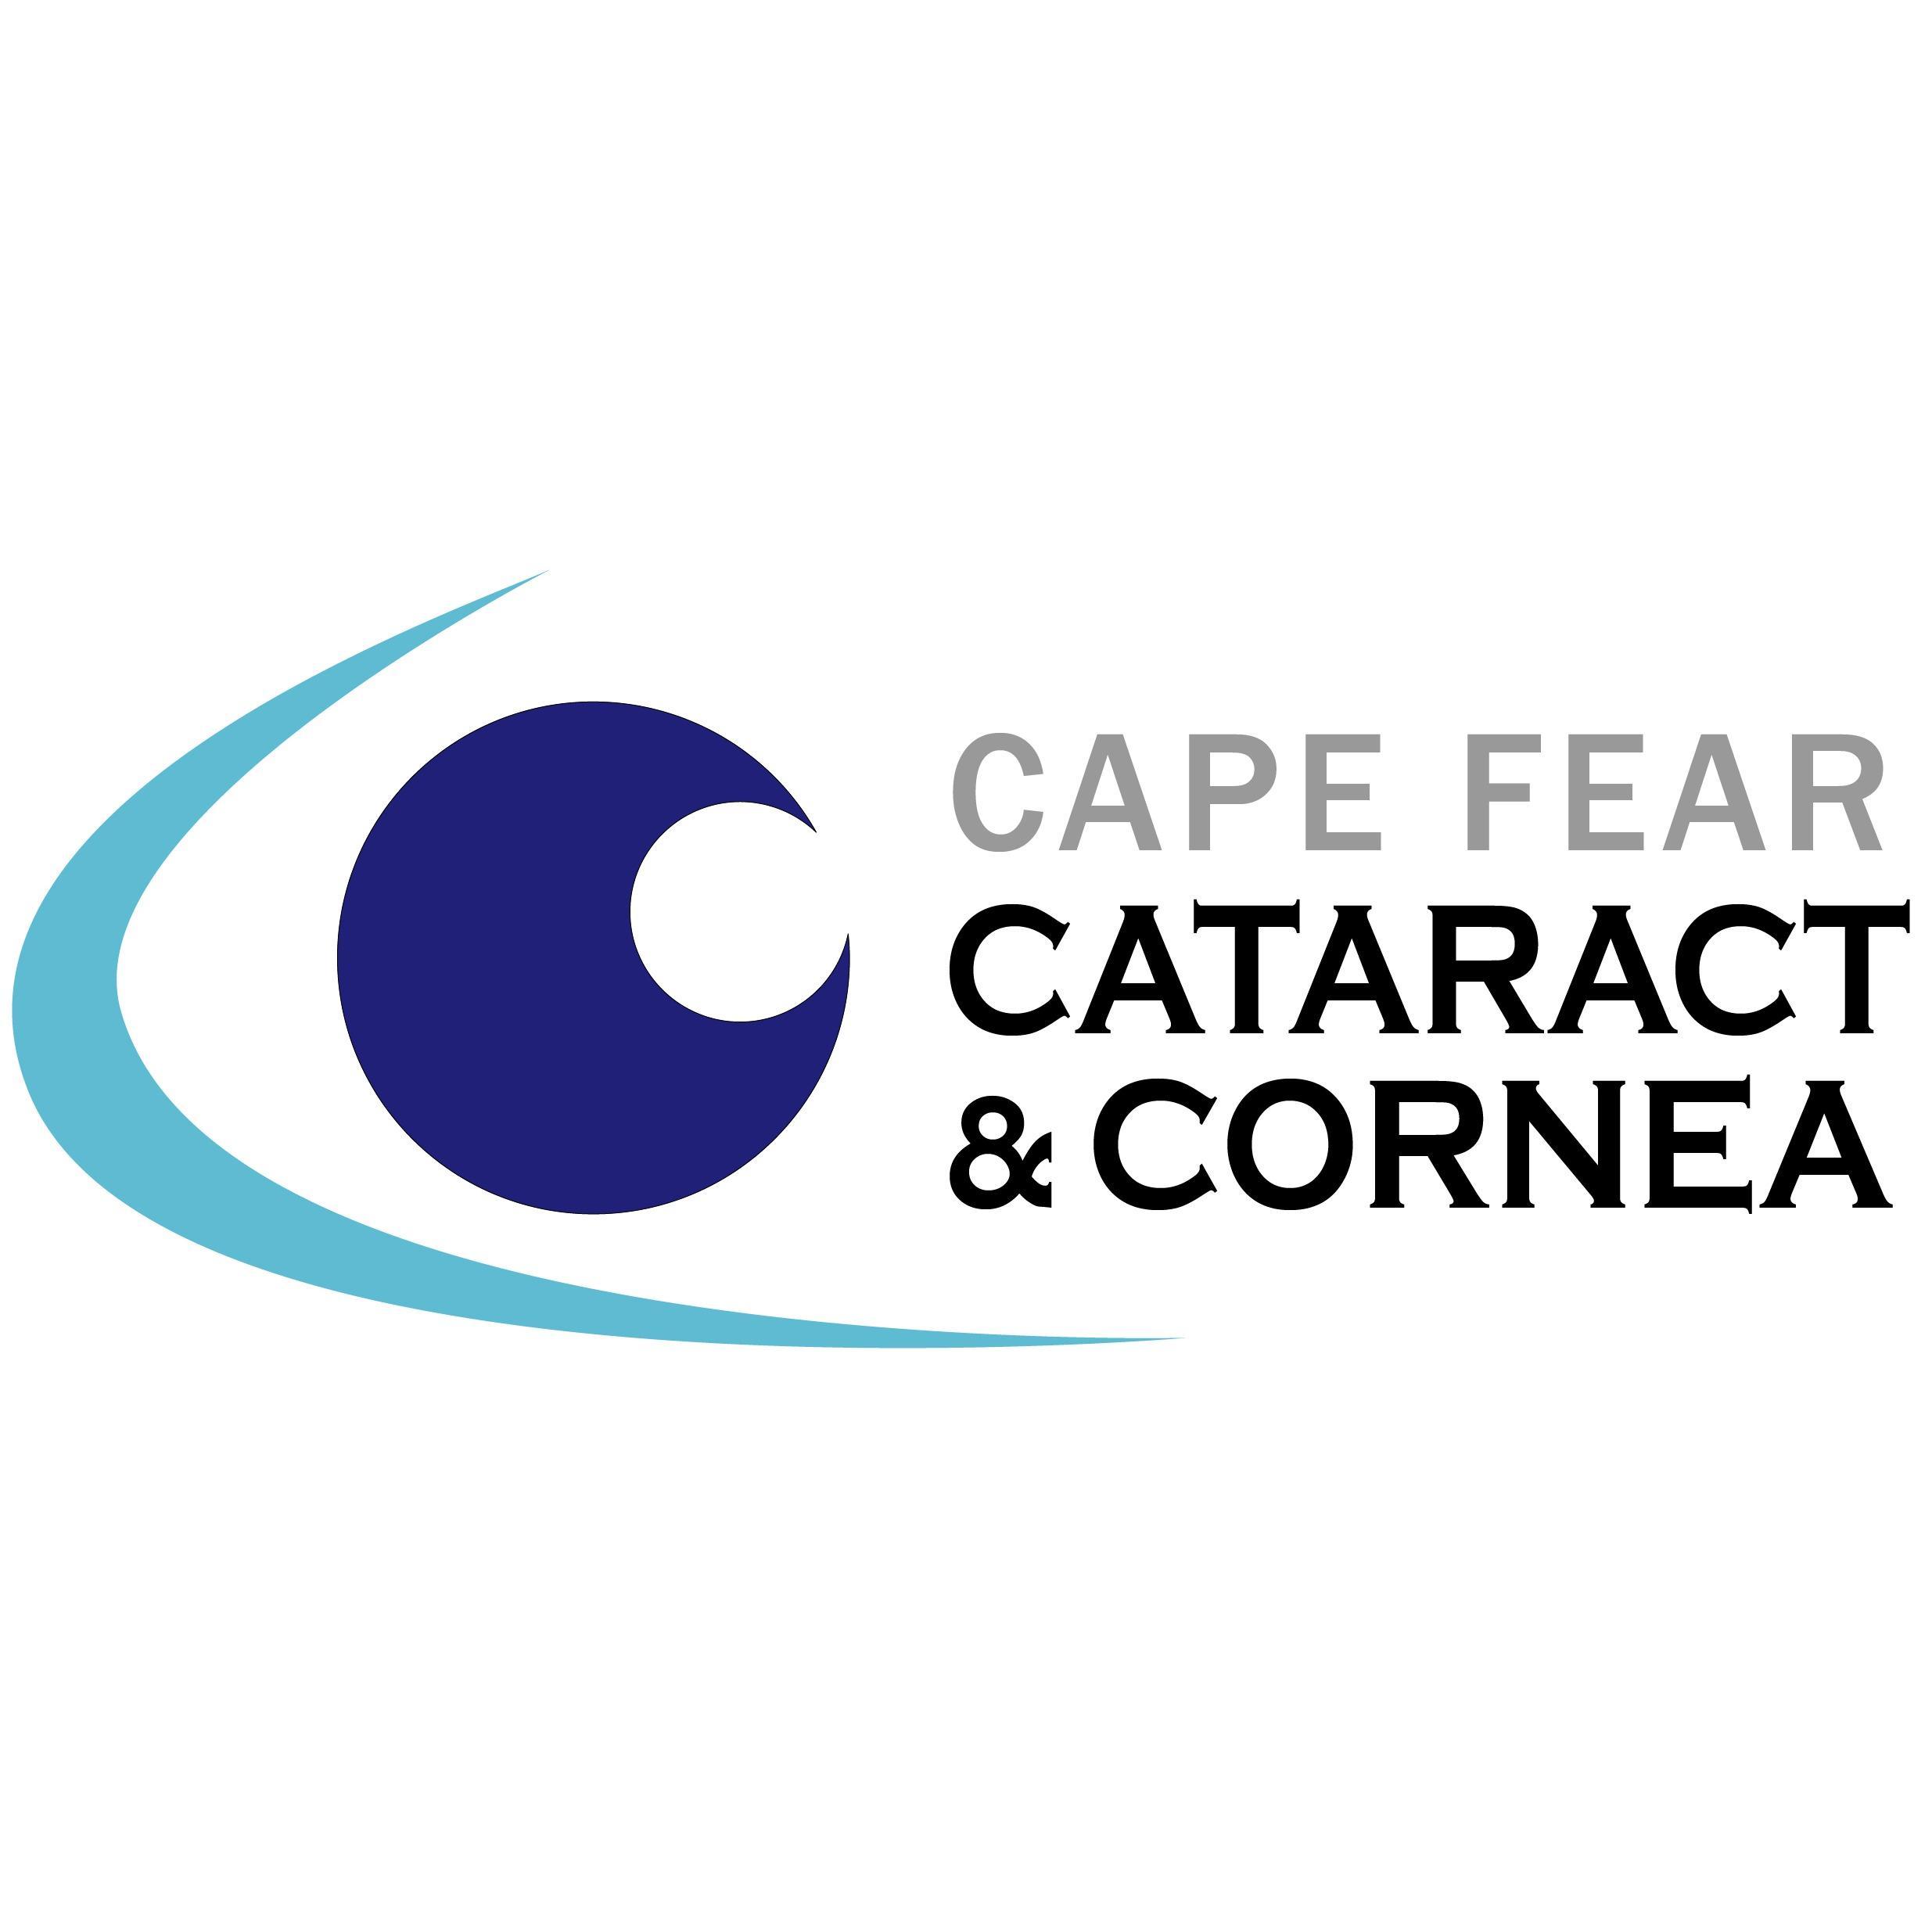 Cape Fear Cataract & Cornea, P.A. image 1